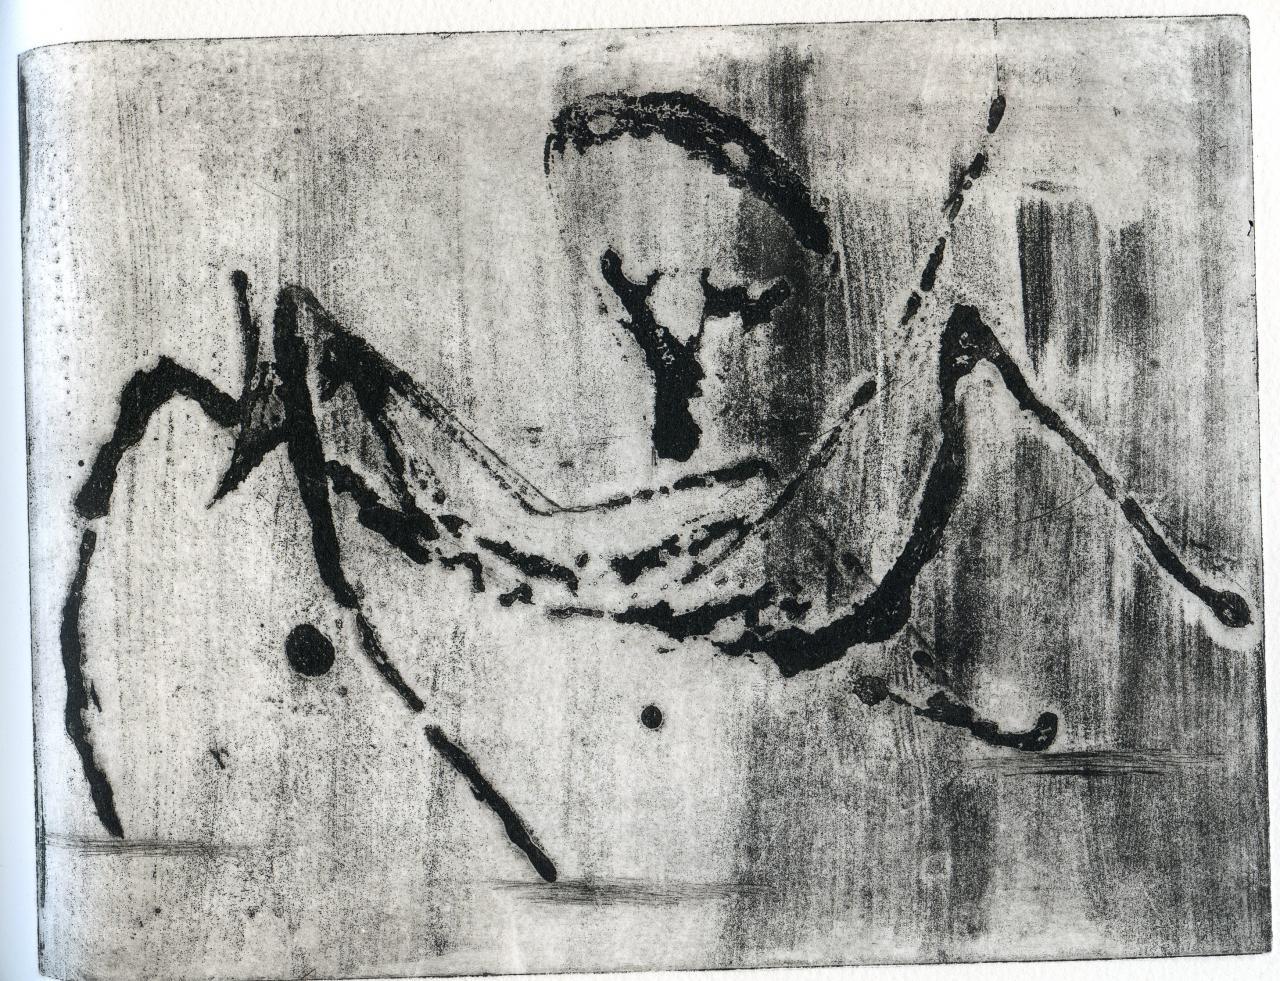 La Sauterelle (Sculpture originale de Alain Donnadieu)